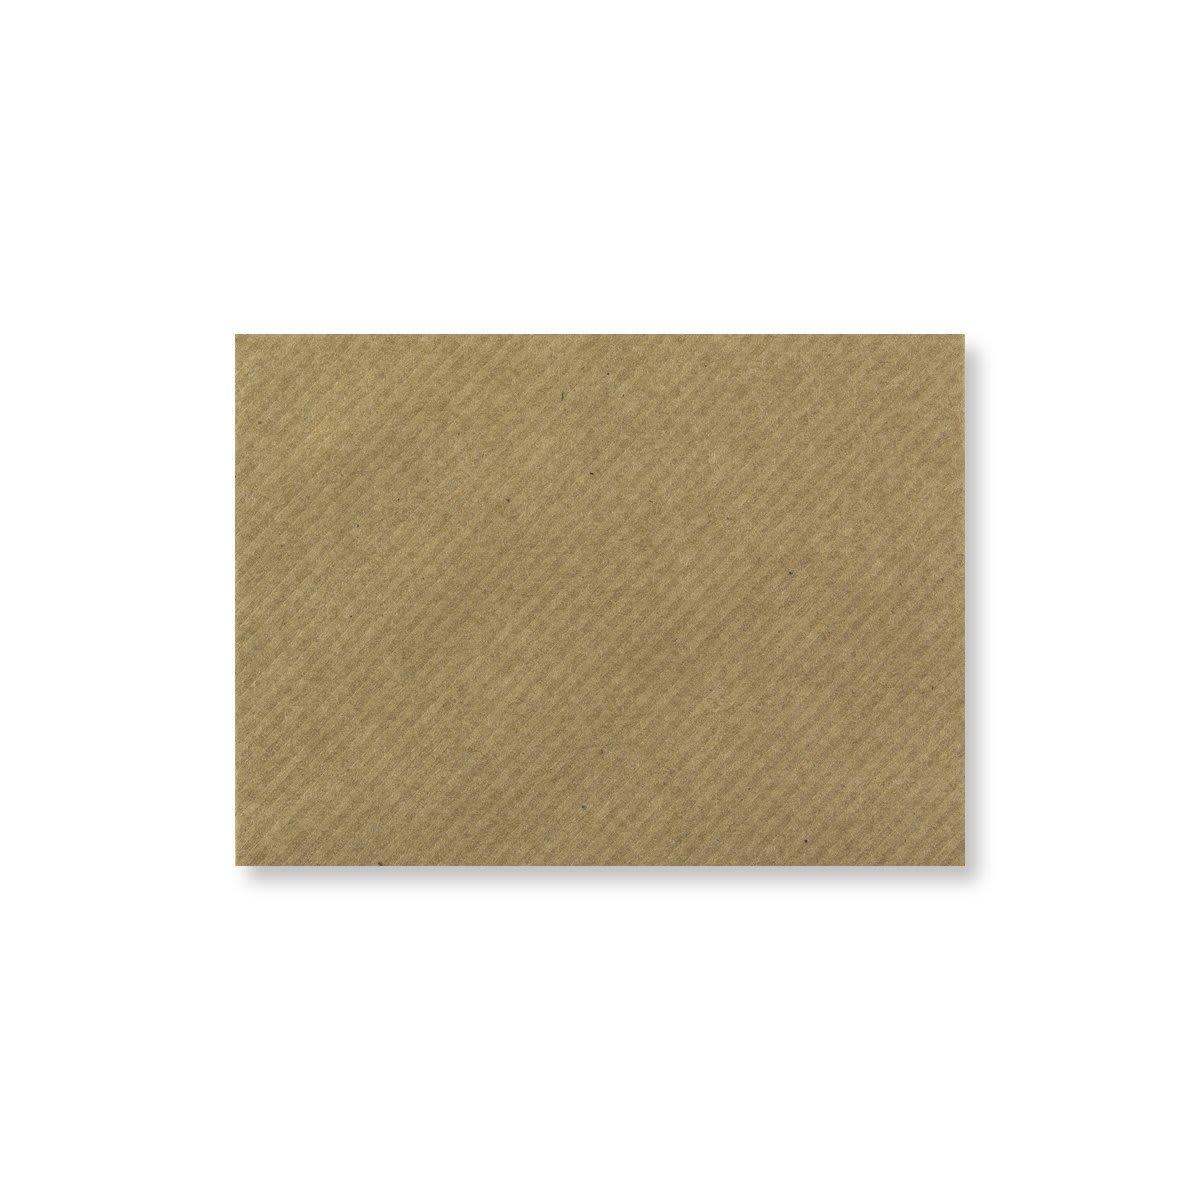 RIBBED KRAFT 70 x 100 mm GIFT TAG ENVELOPE (i2)